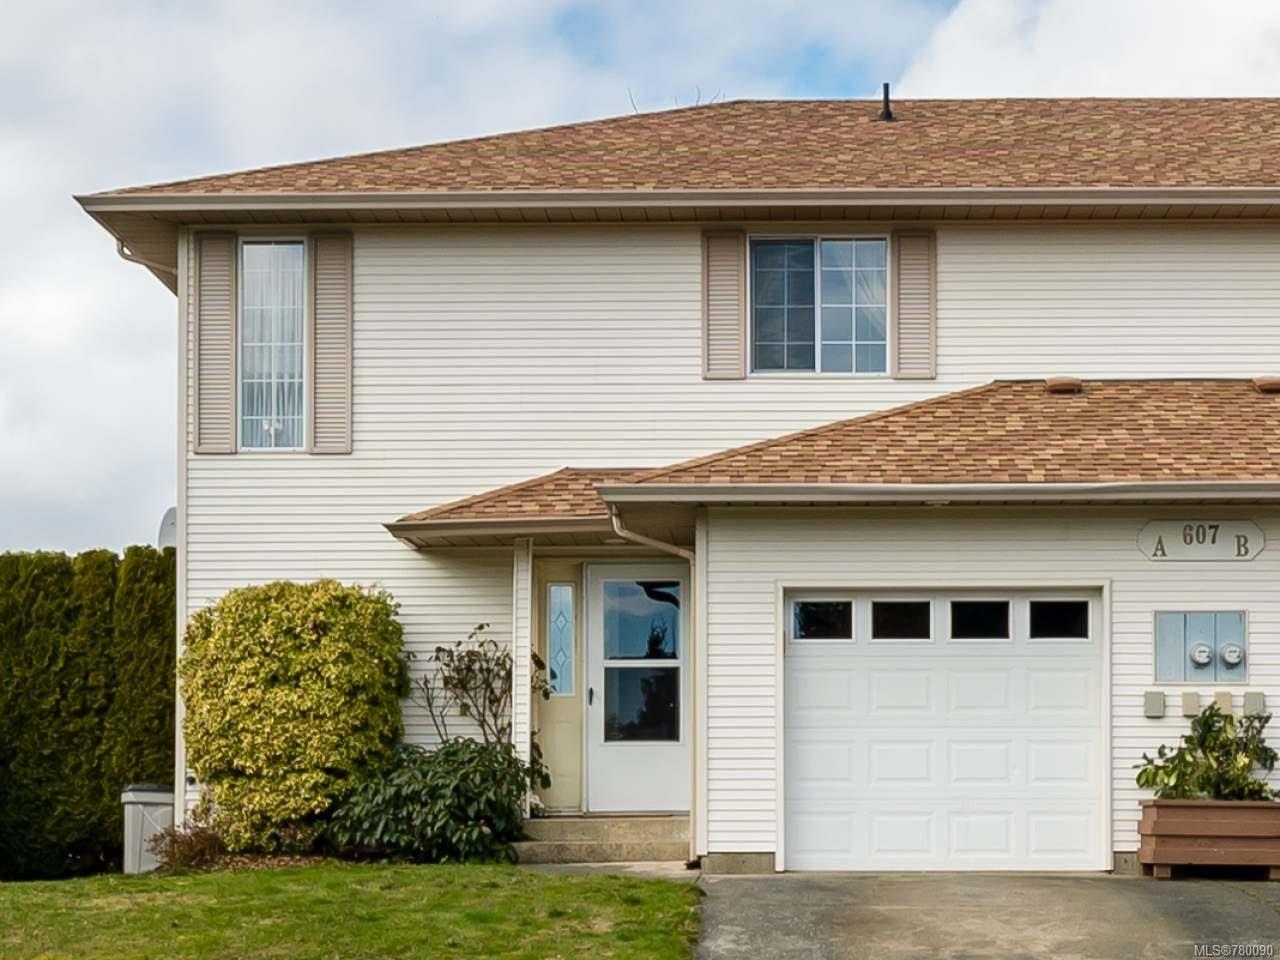 Main Photo: A 607 Bunting Pl in COMOX: CV Comox (Town of) Half Duplex for sale (Comox Valley)  : MLS®# 780090